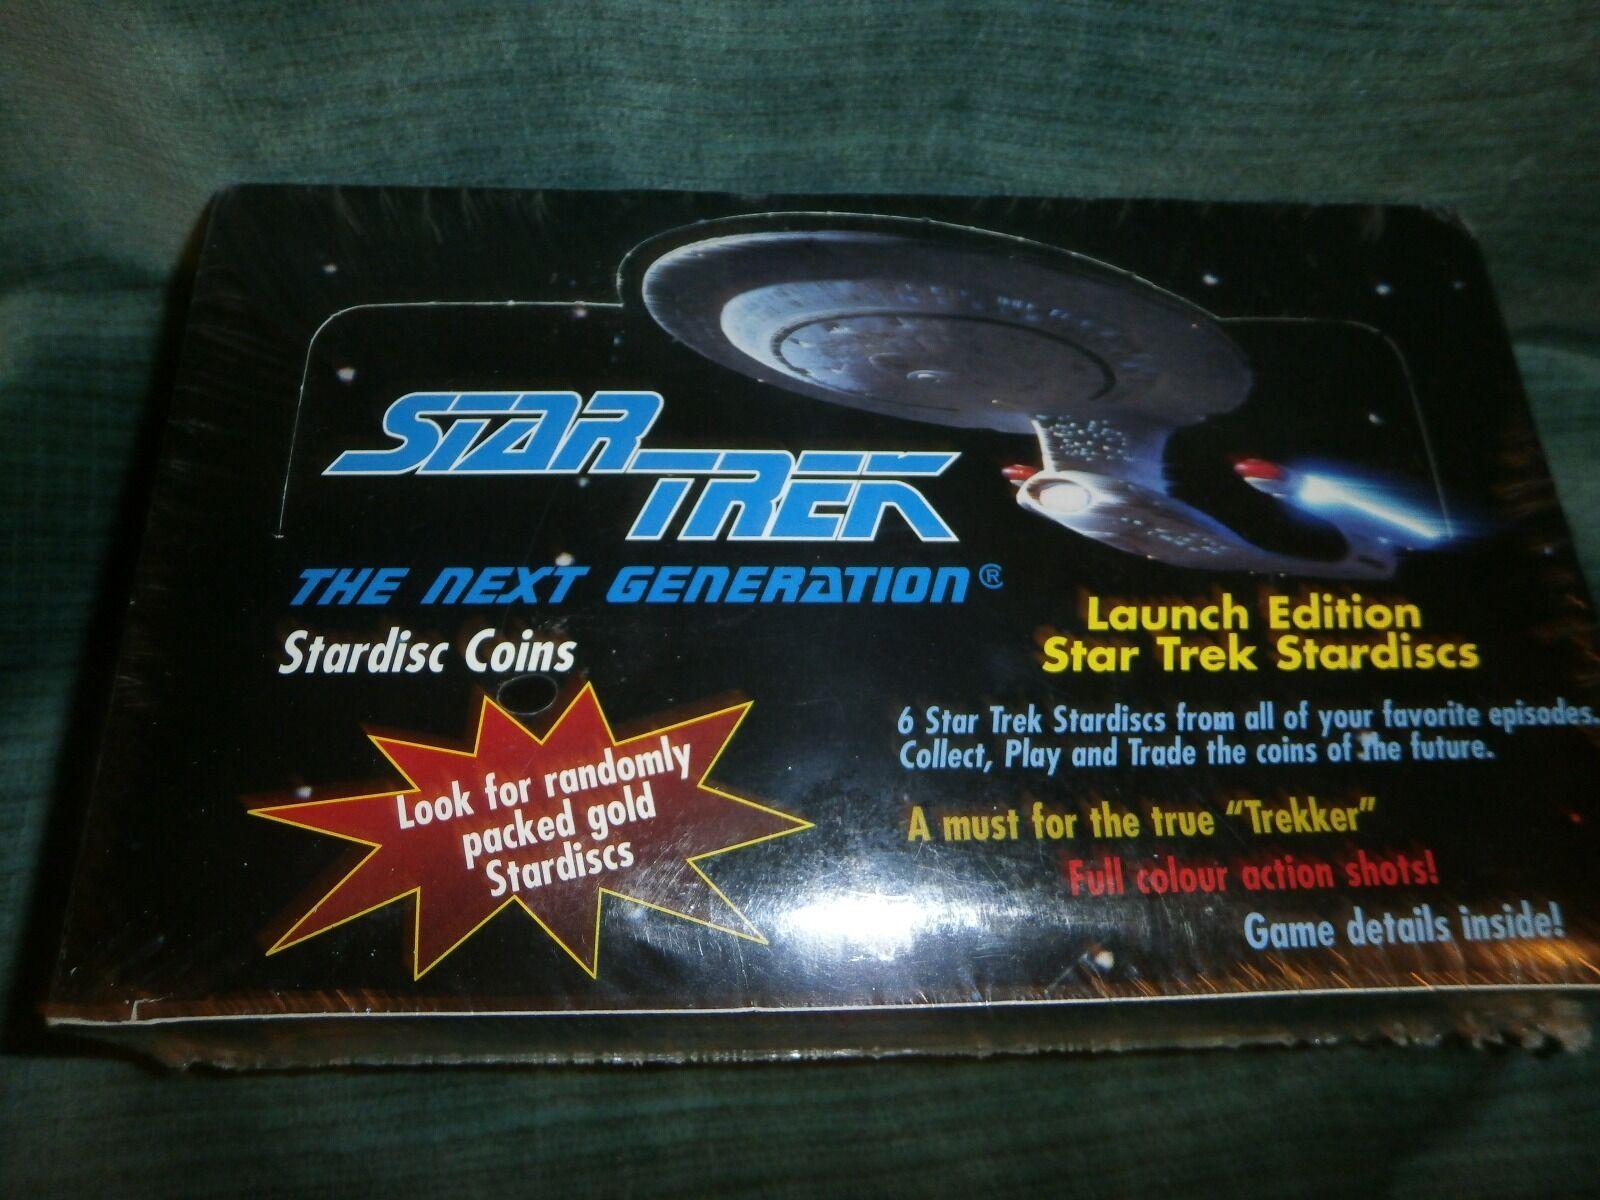 STAR TREK LAUNCH EDITION STAR TREK STARDISCS New  A brand-new, unused, unopened,